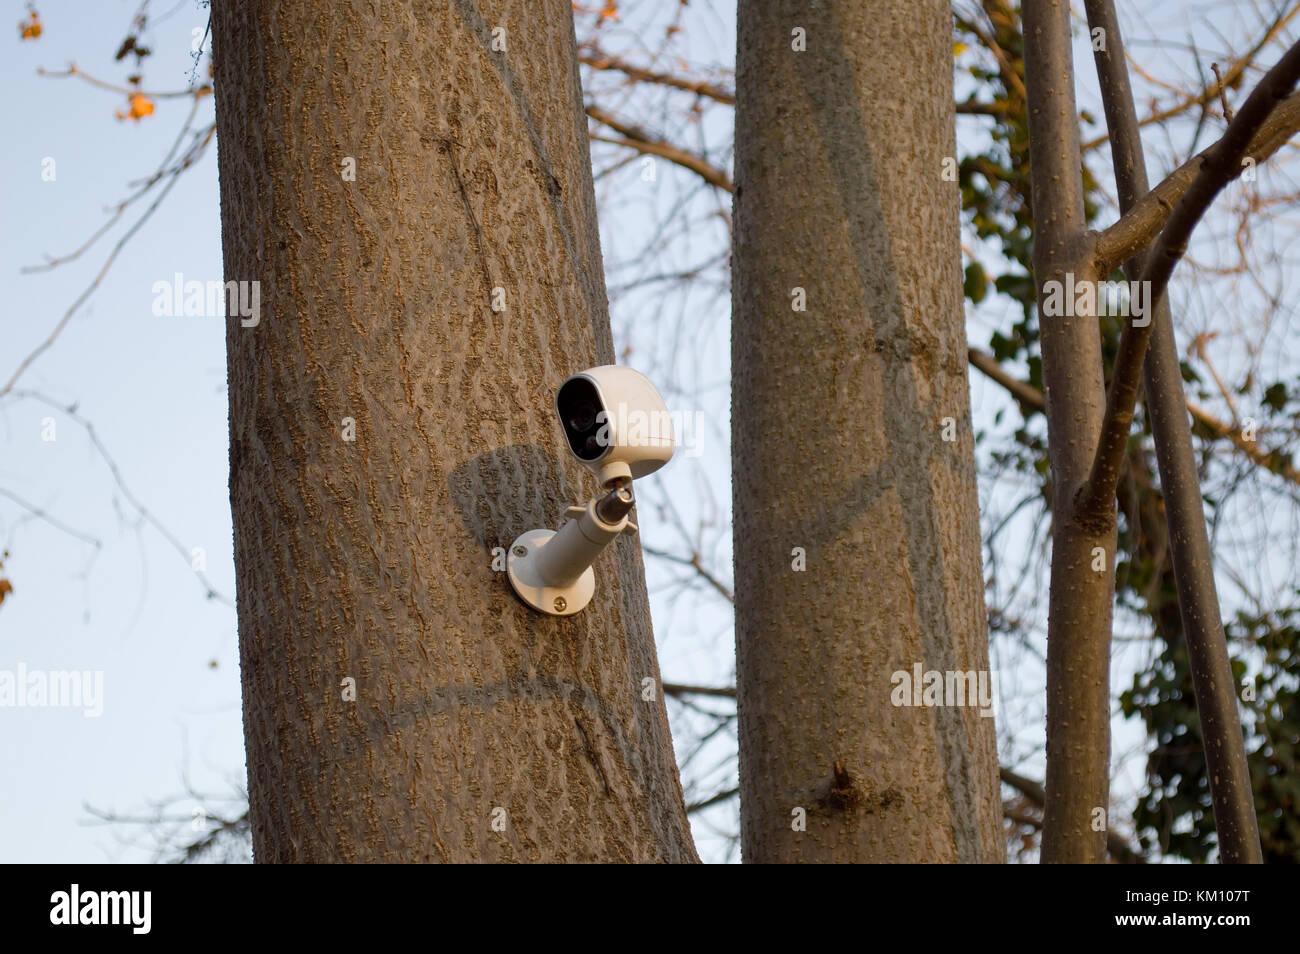 Tree Mounted Surveillance Camera - Stock Image